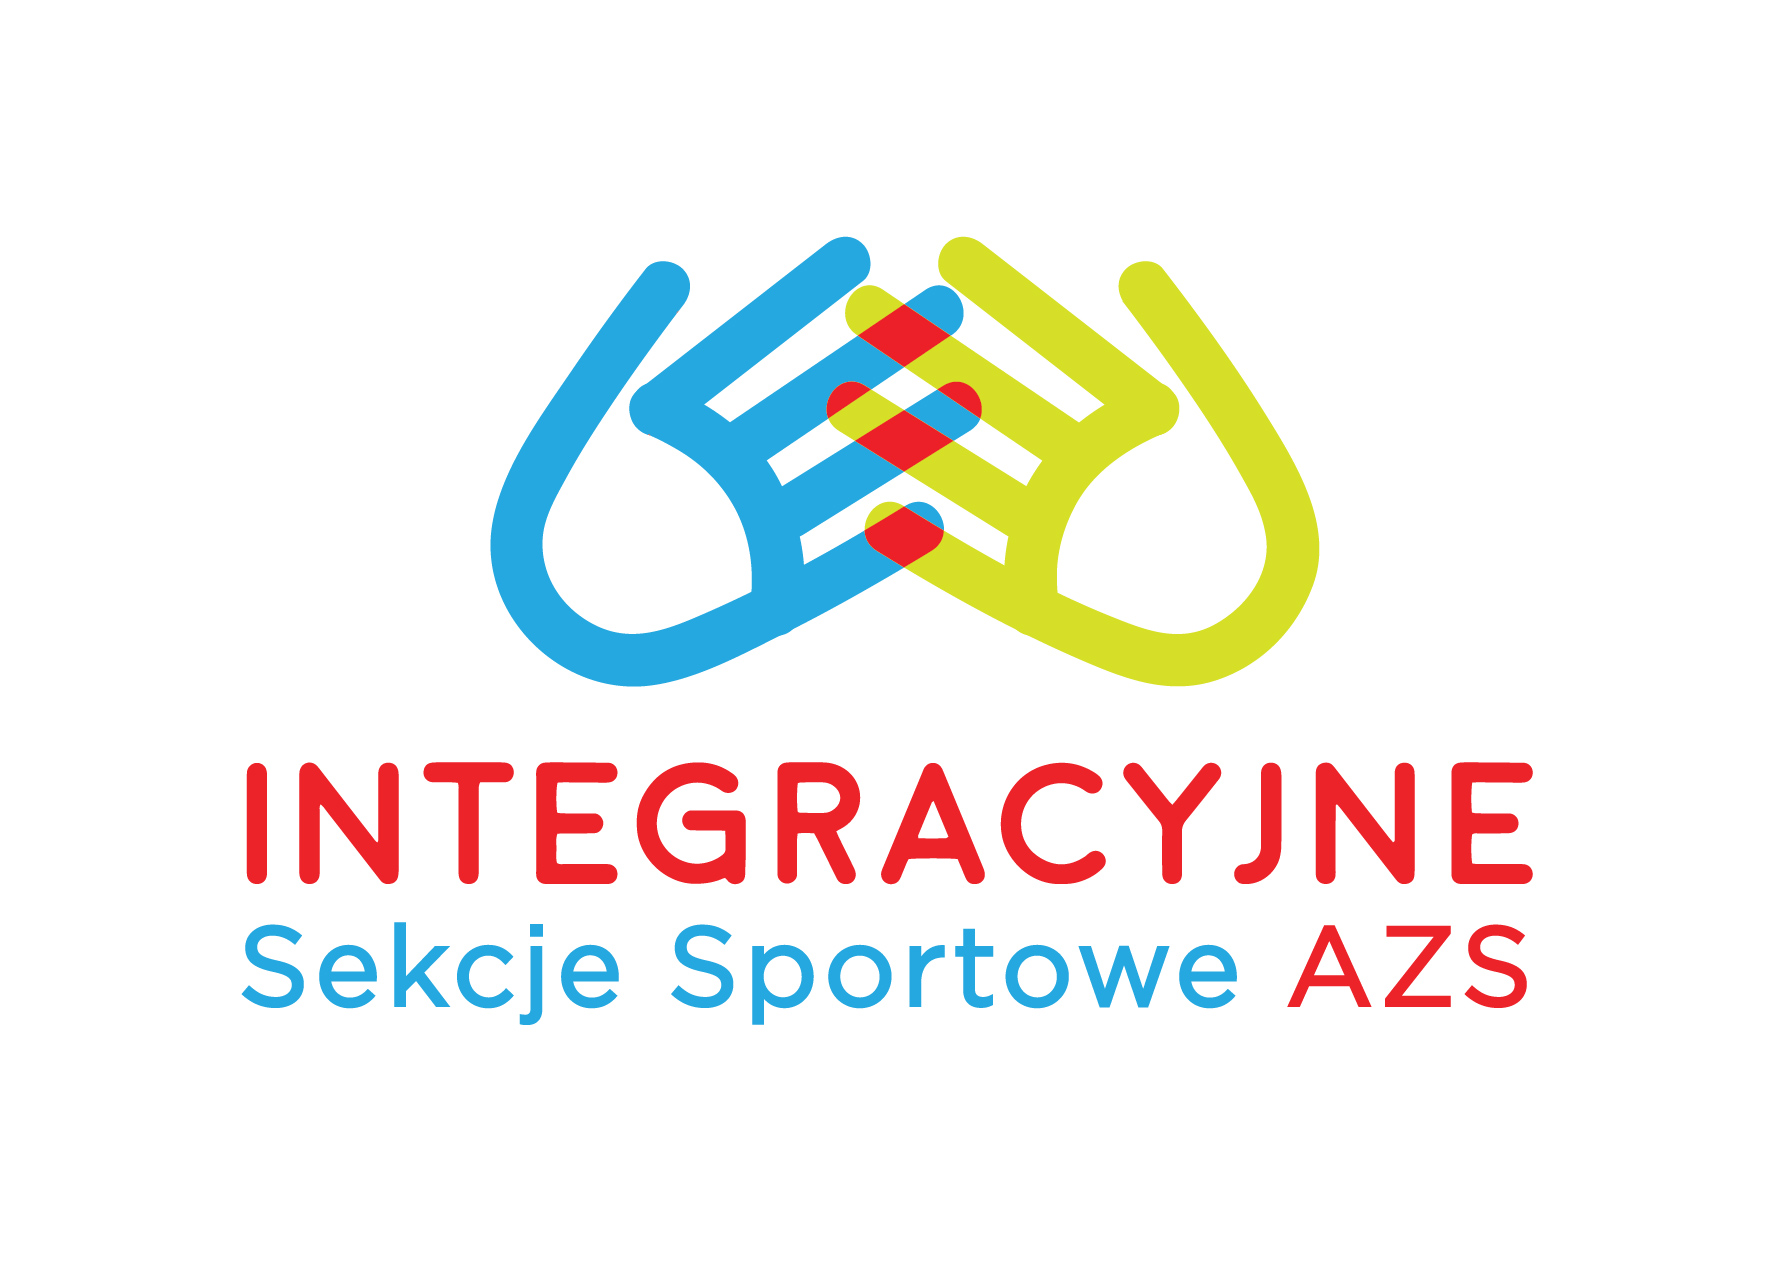 Integracyjne Sekcje Sportowe